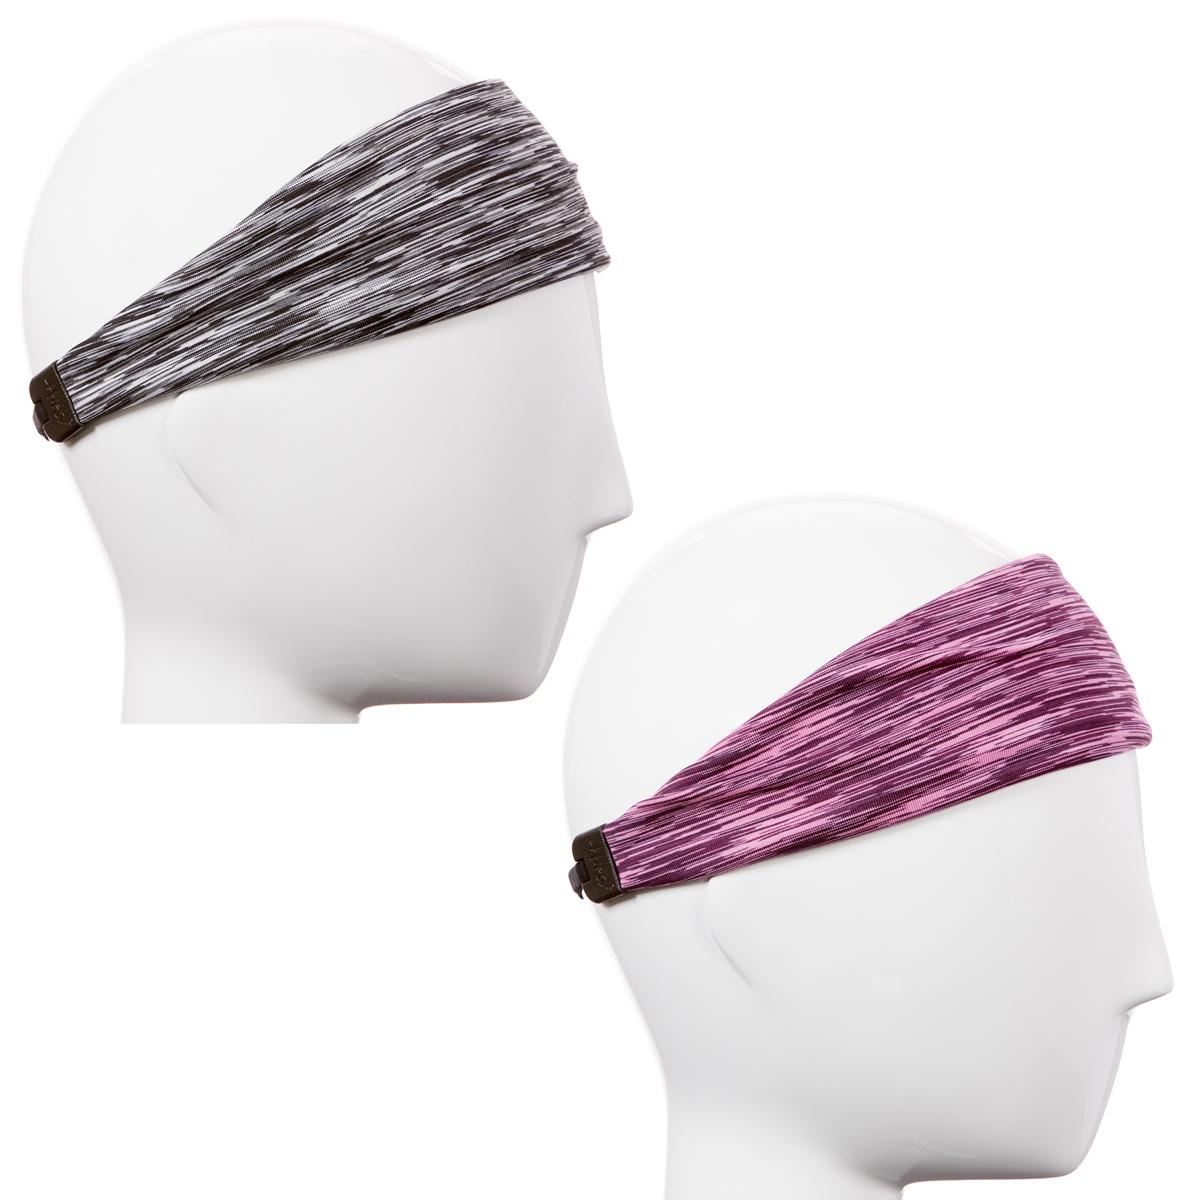 Hipsy Women's Adjustable & Stretchy Xflex Band Space Dye Headband 2pk (Grey & Pink)